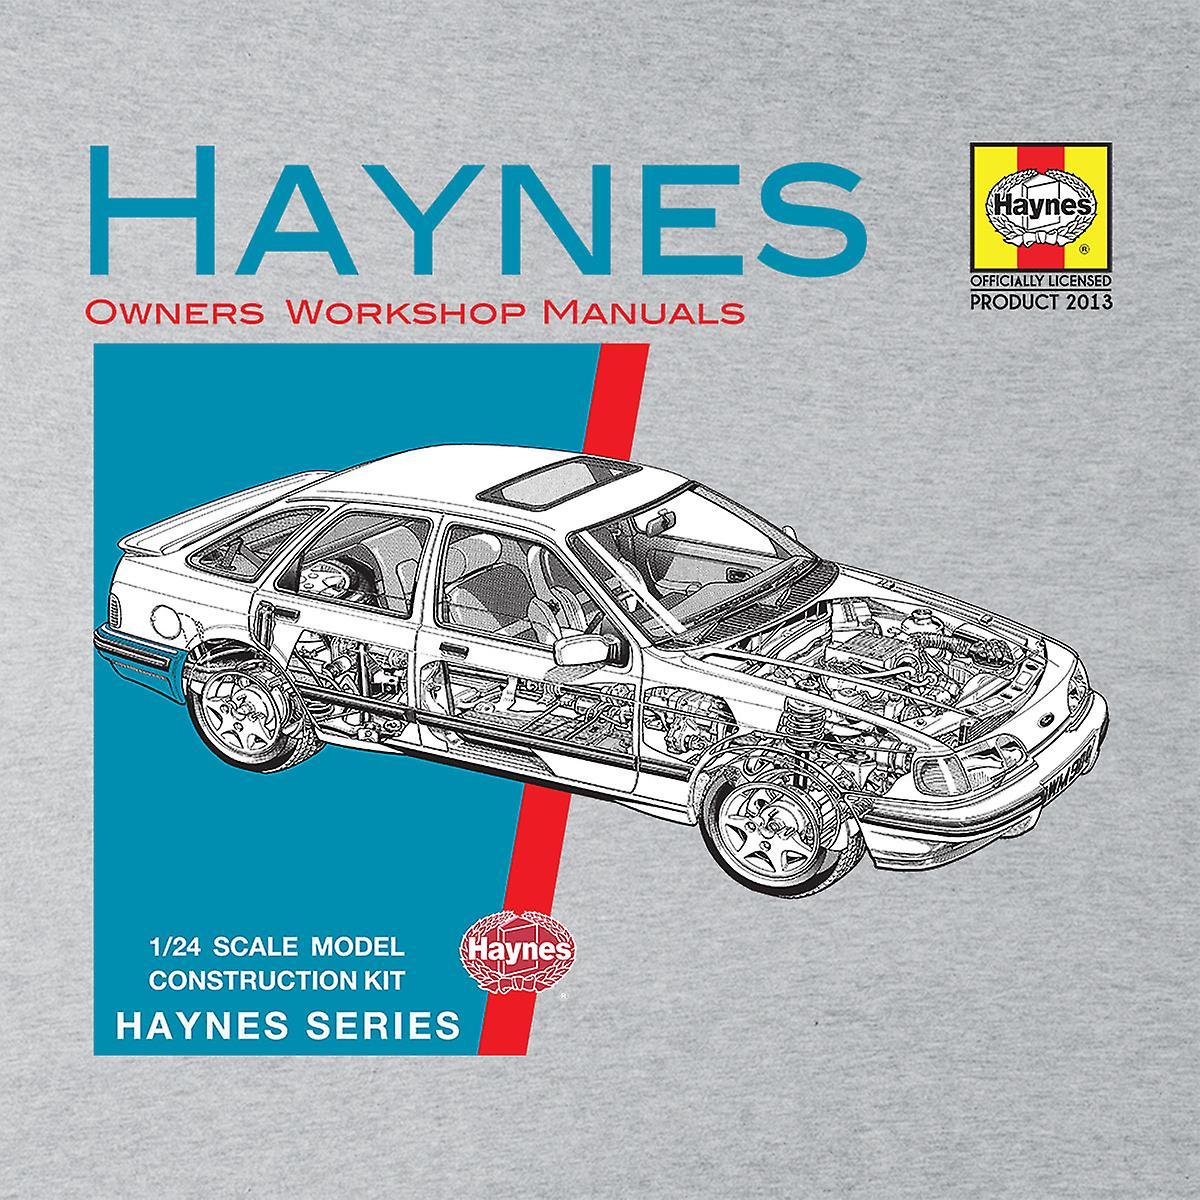 Haynes Owners Workshop Manual 0904 Ford Sierra V6 4 X 4 mannen Varsity Jacket